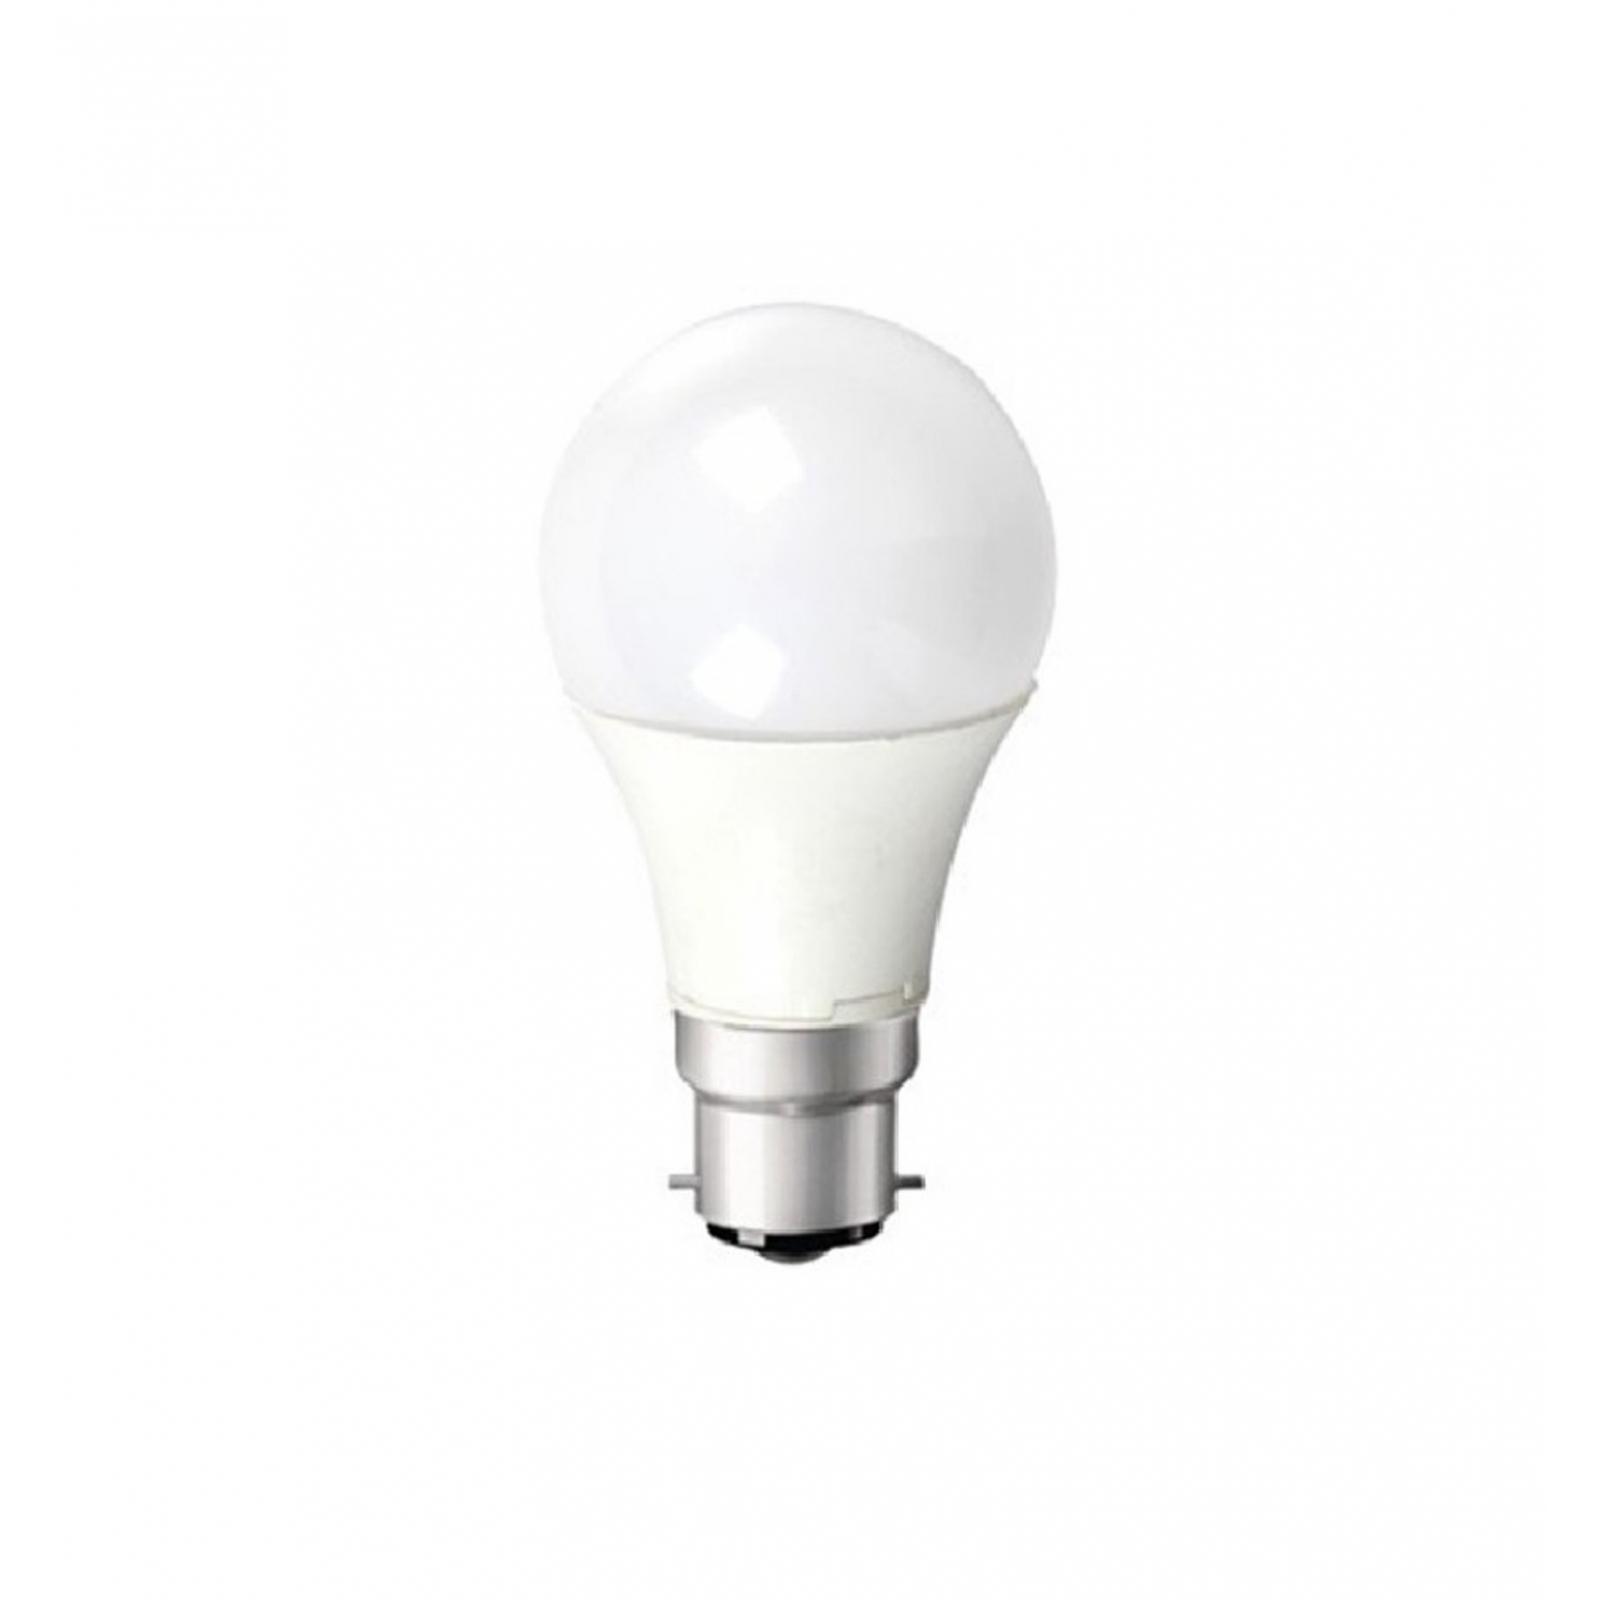 Ampoule LED B22 12W Blanc Neutre 4500K